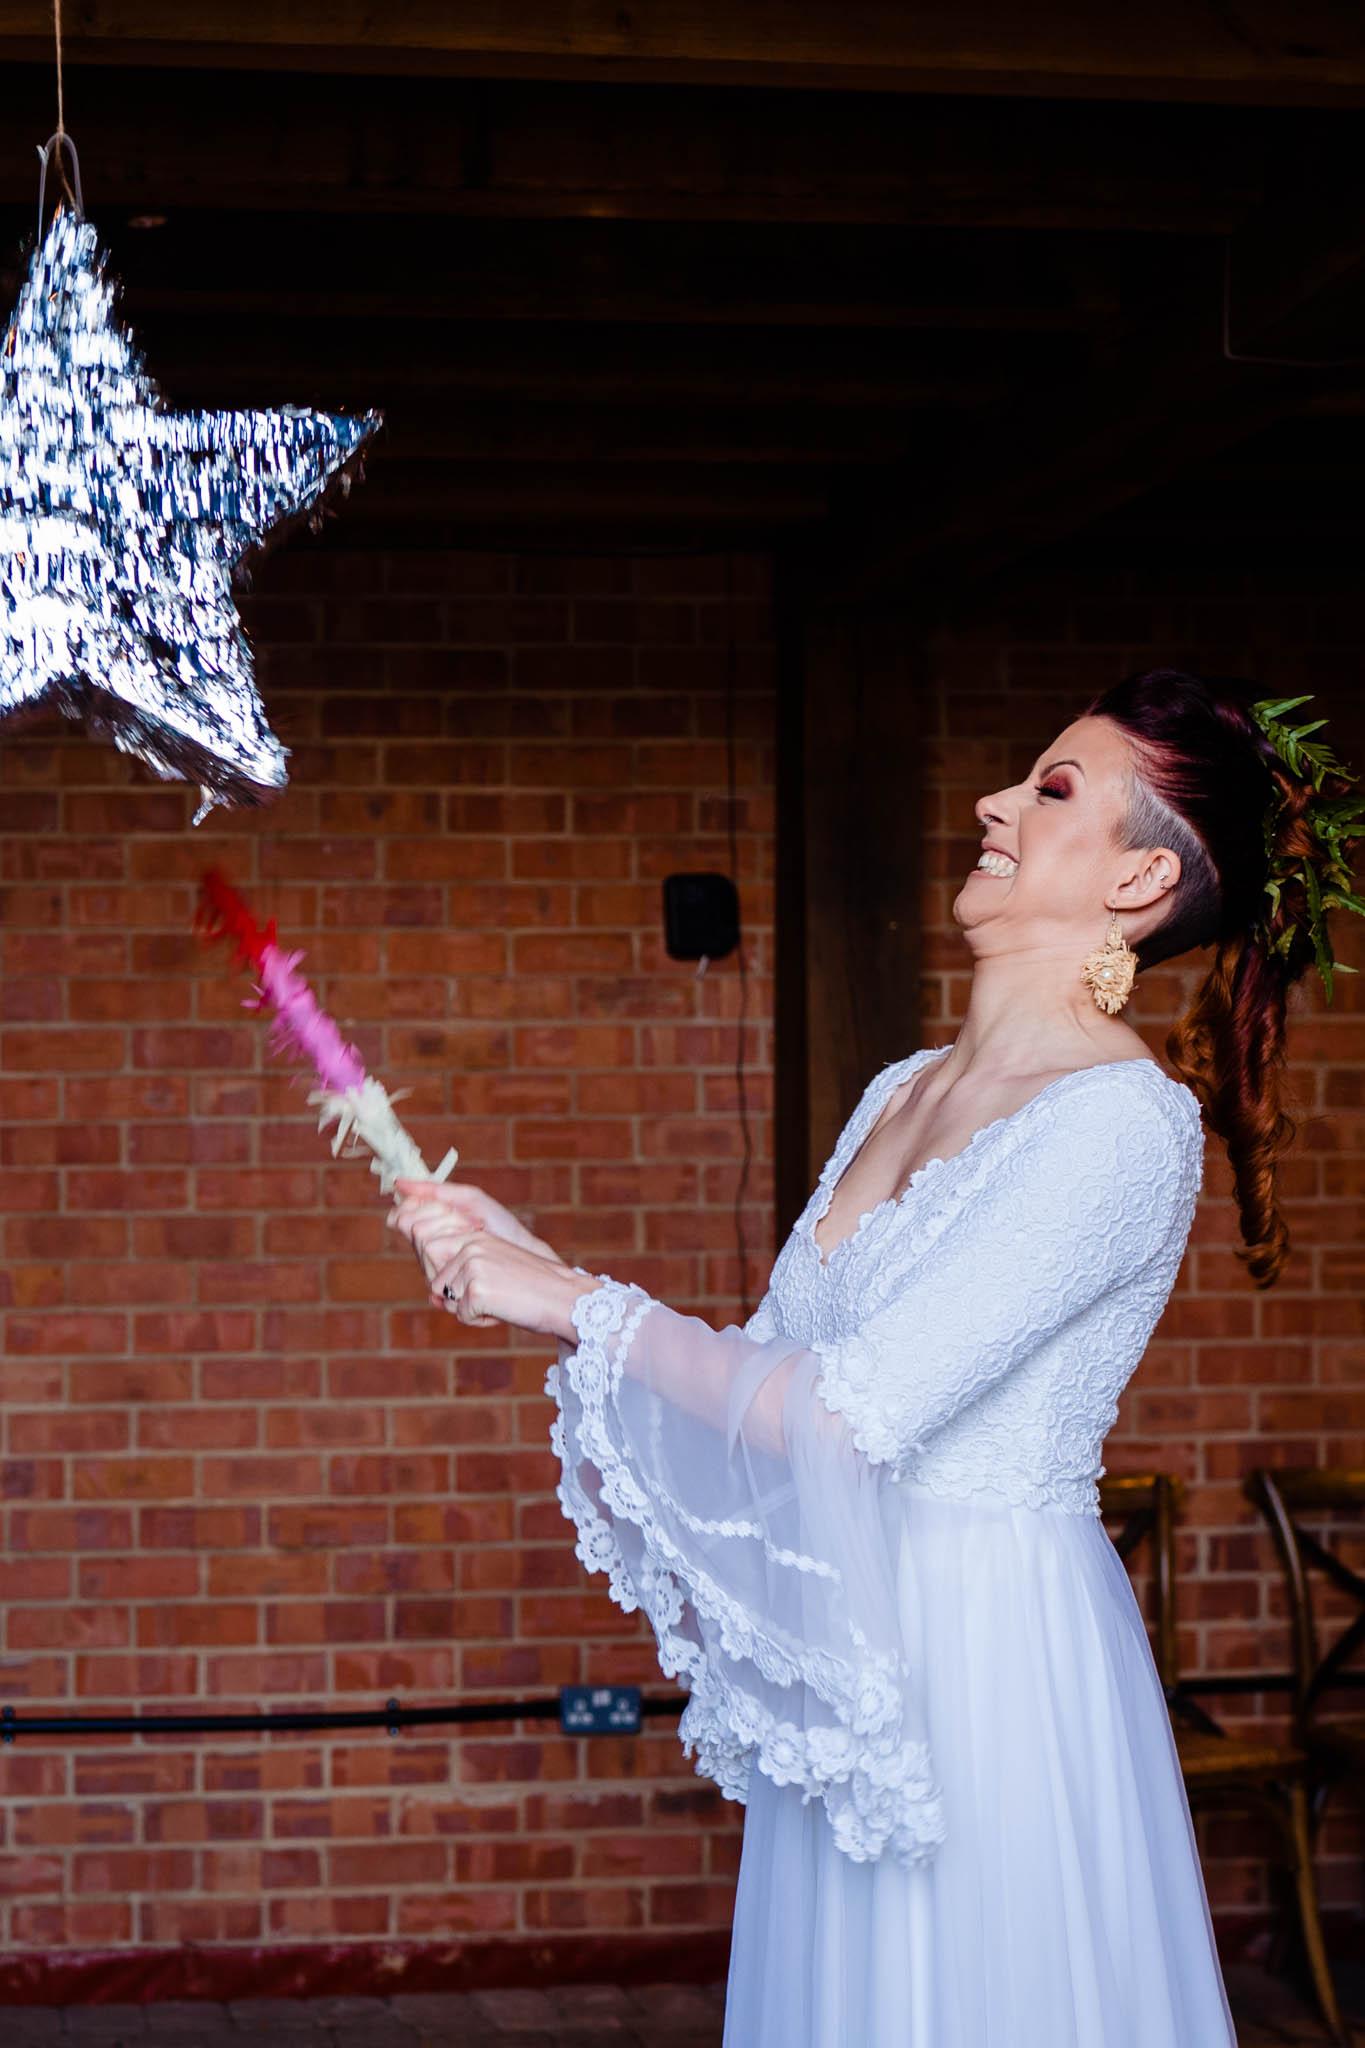 wedding pinata - fun wedding ideas - modern tropical wedding - modern wedding - modern bride - east midlands wedding planner